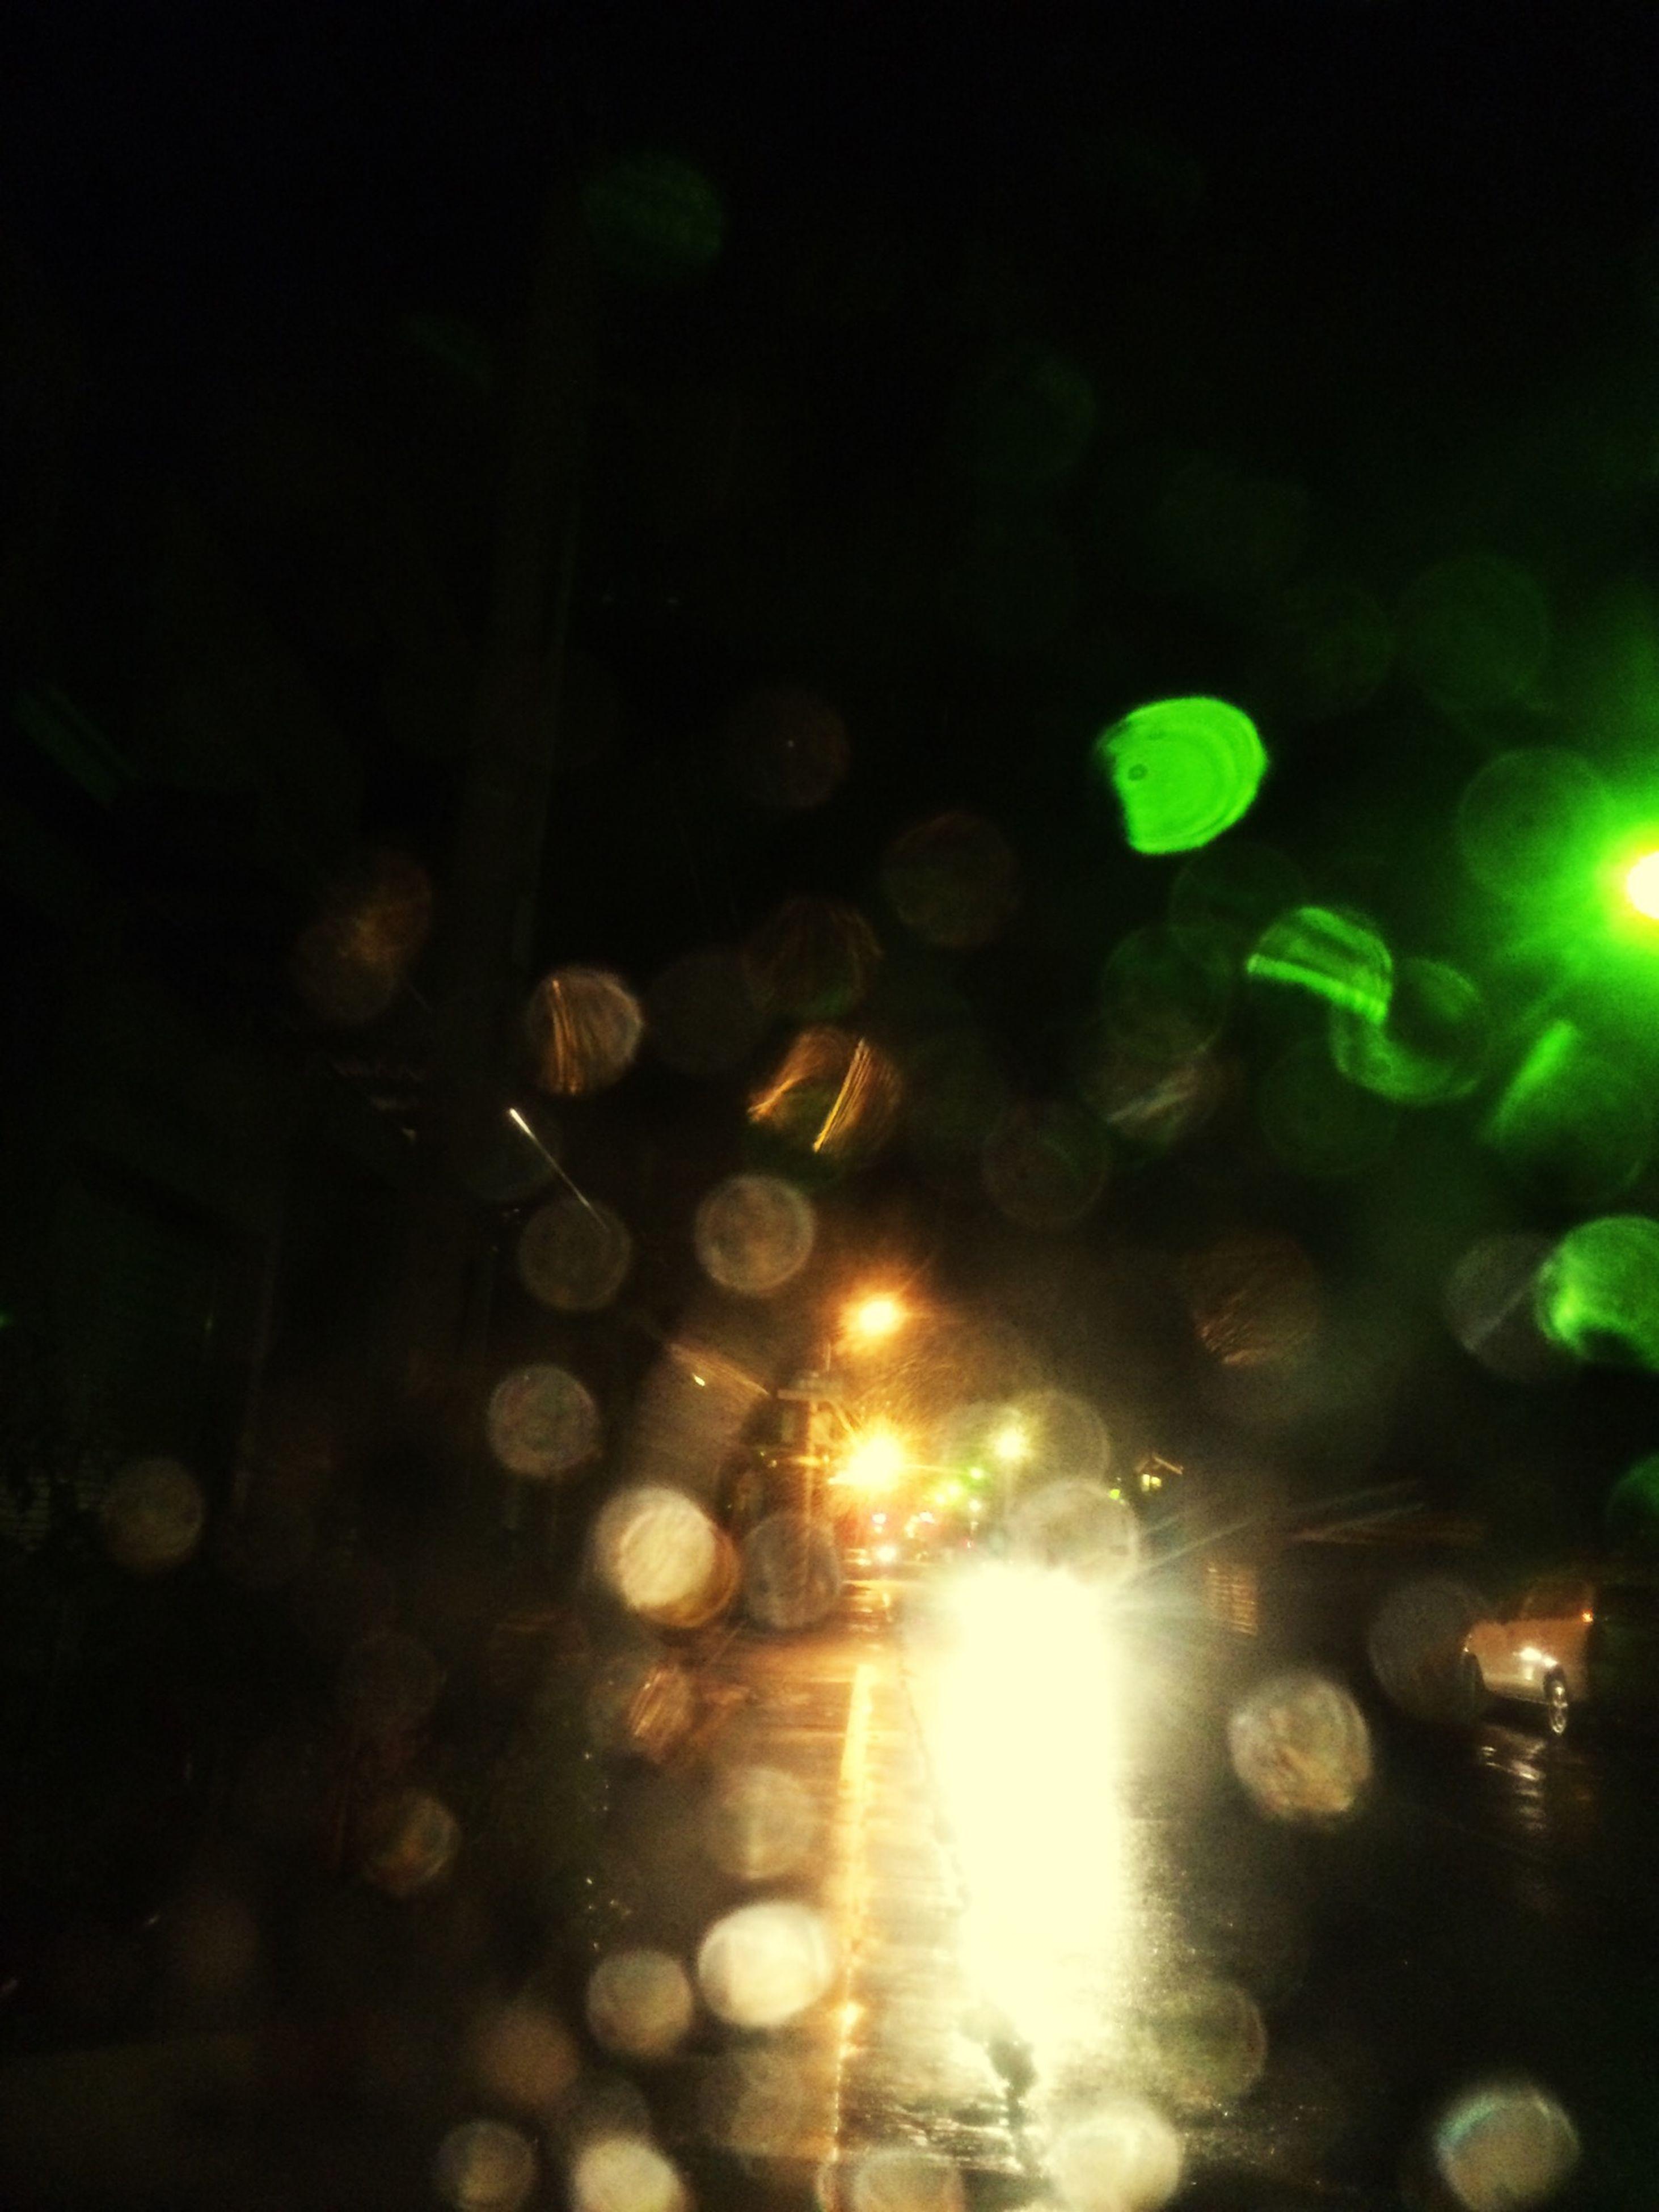 illuminated, night, lens flare, transportation, car, street, land vehicle, street light, light - natural phenomenon, defocused, lighting equipment, road, glowing, mode of transport, blurred motion, motion, wet, outdoors, city street, light beam